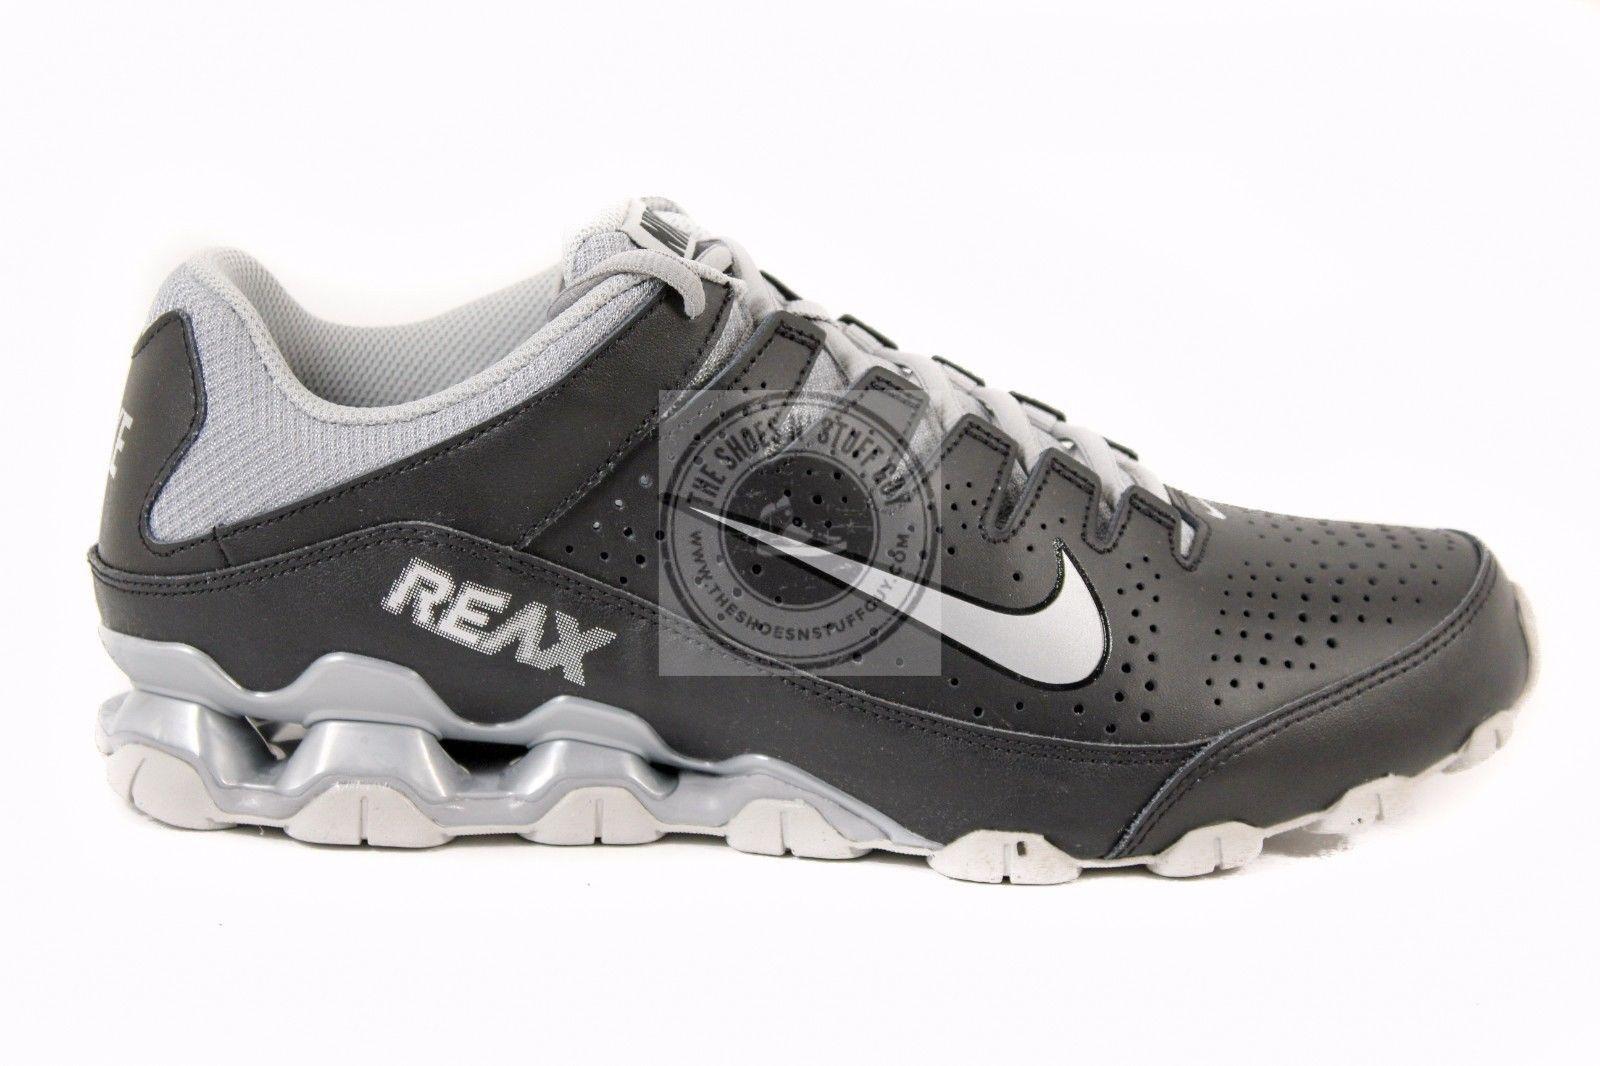 New Men\u0027s Nike Reax Run 8 TR Running Shoes Black Silver 616272 001 Size 11.5